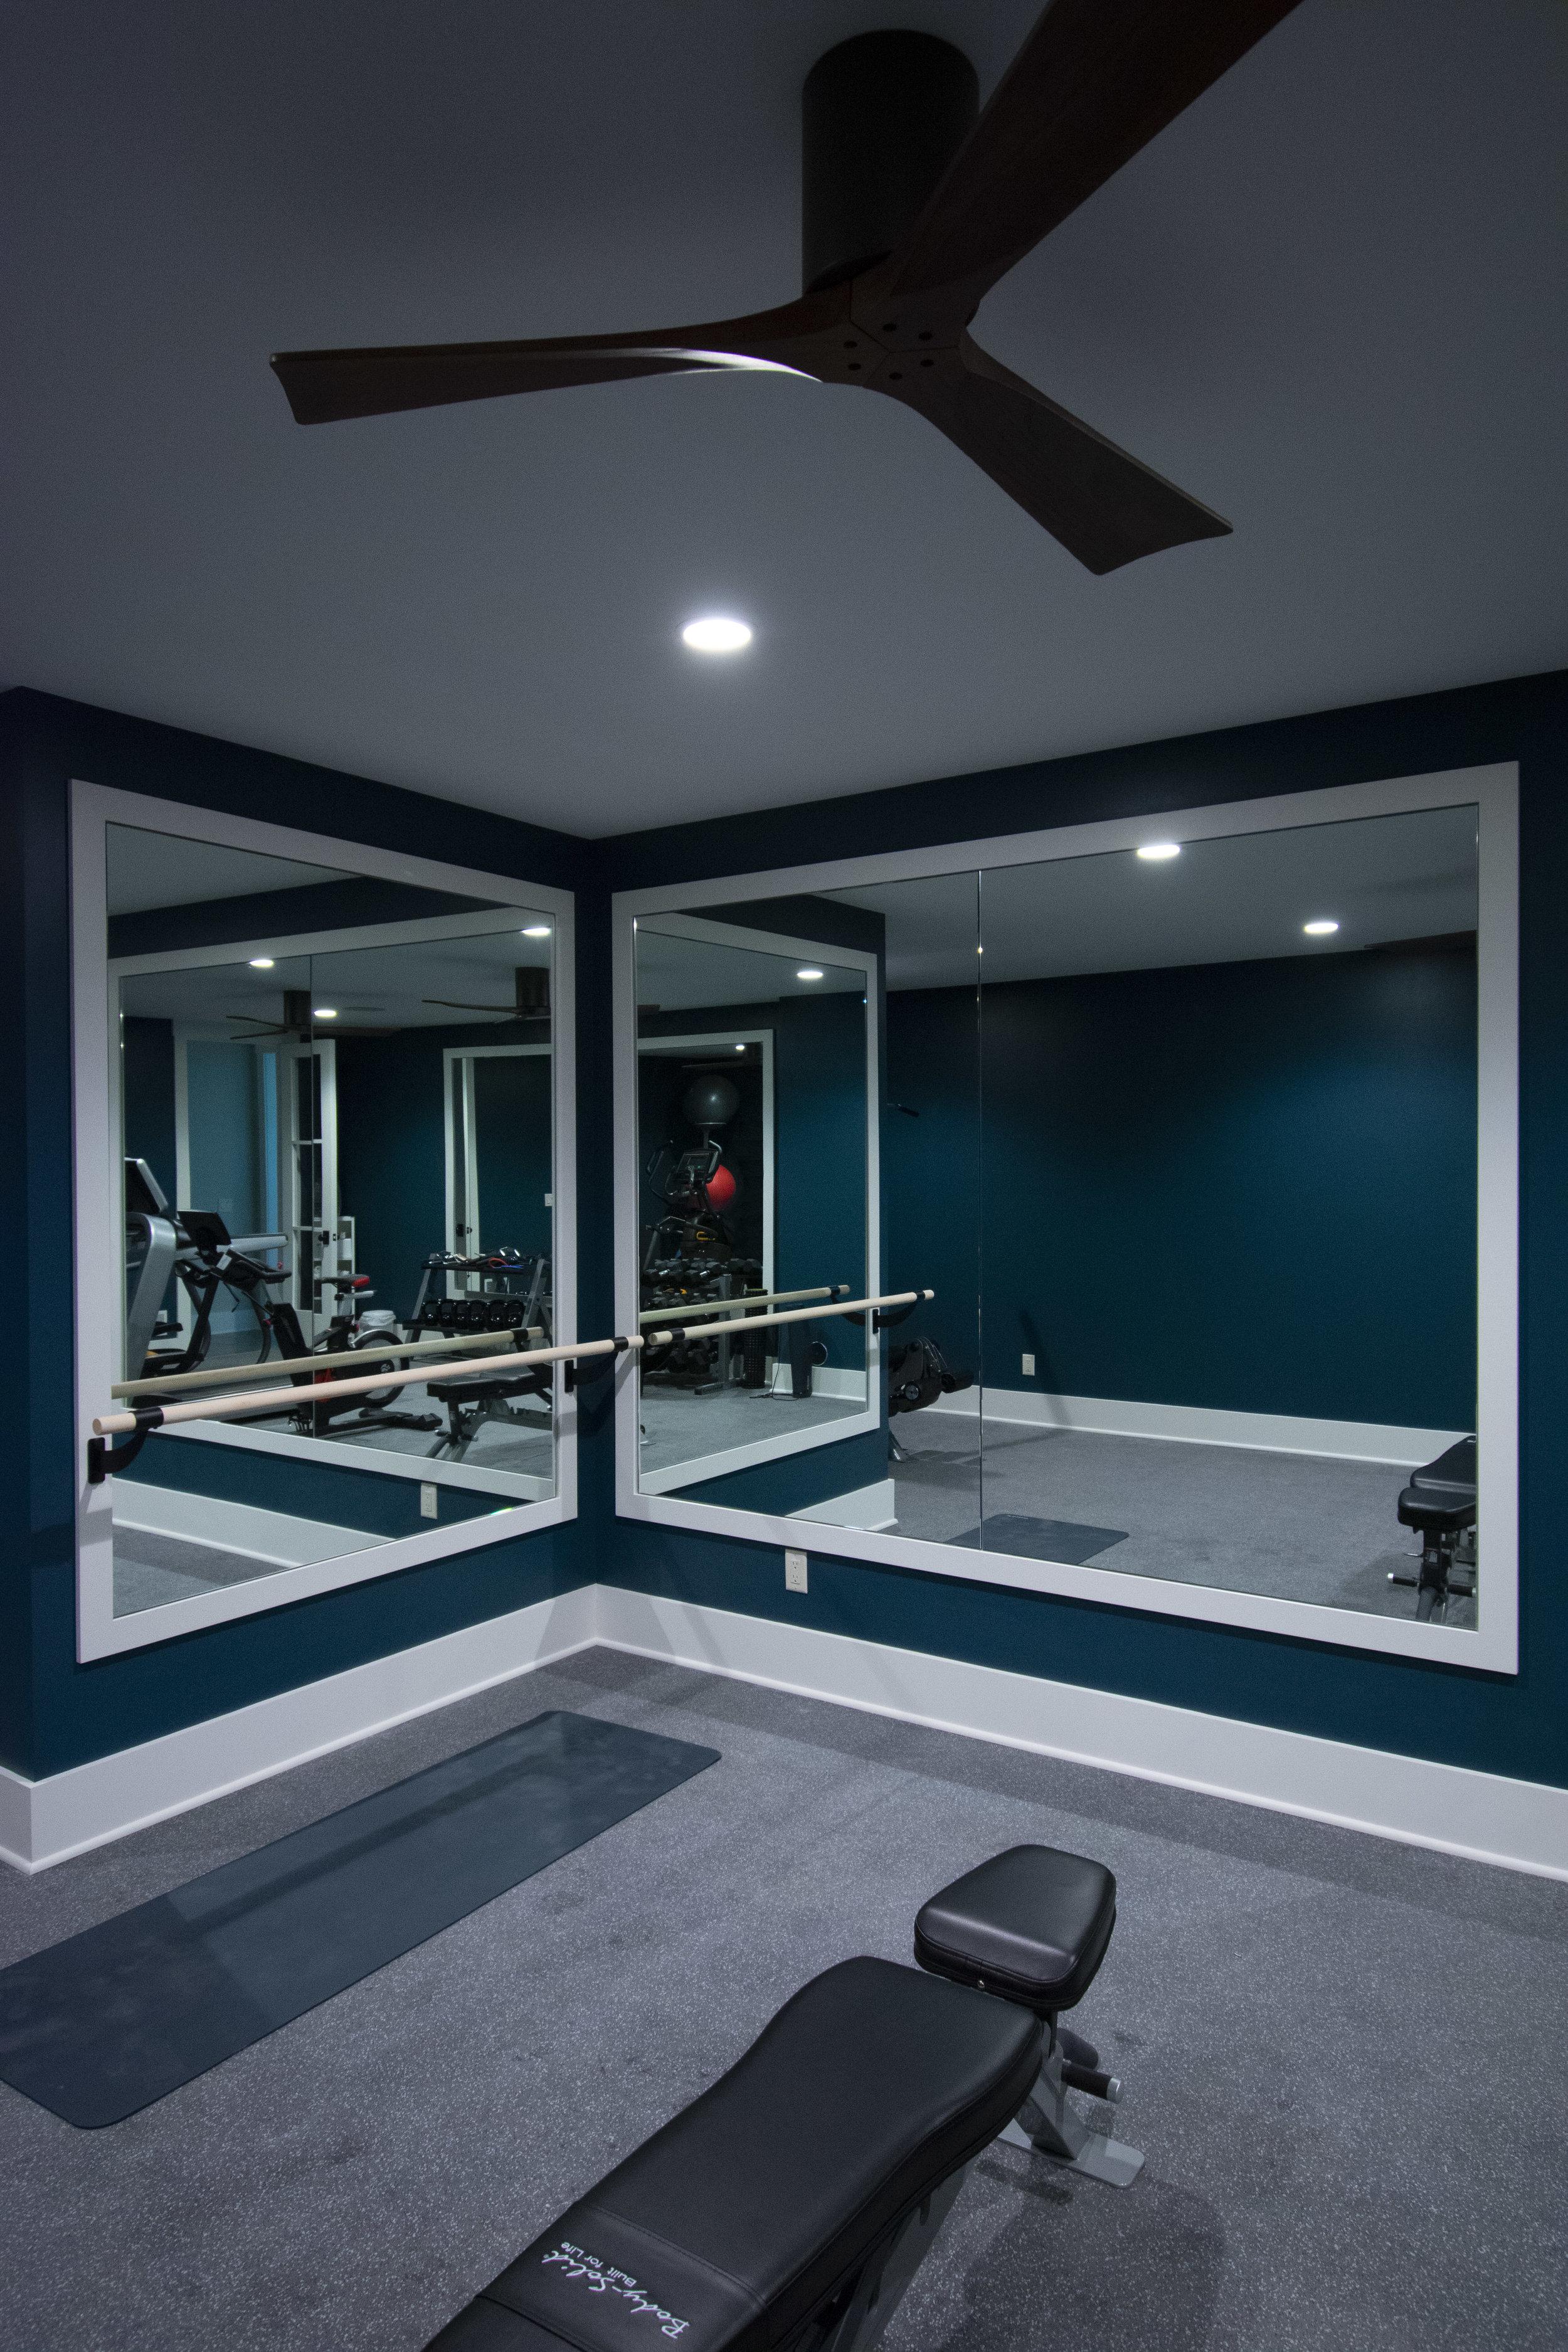 Custom wall mirrors 8-7-18 2.jpg